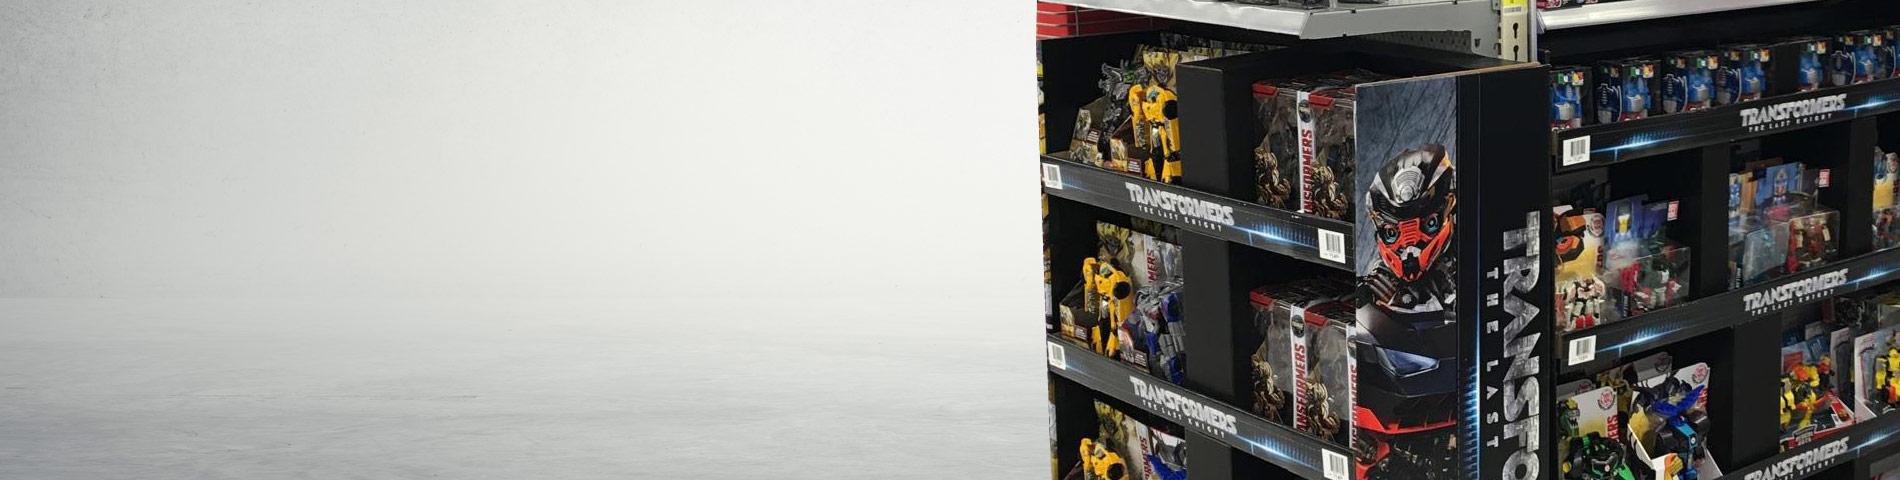 Transformers Train Display